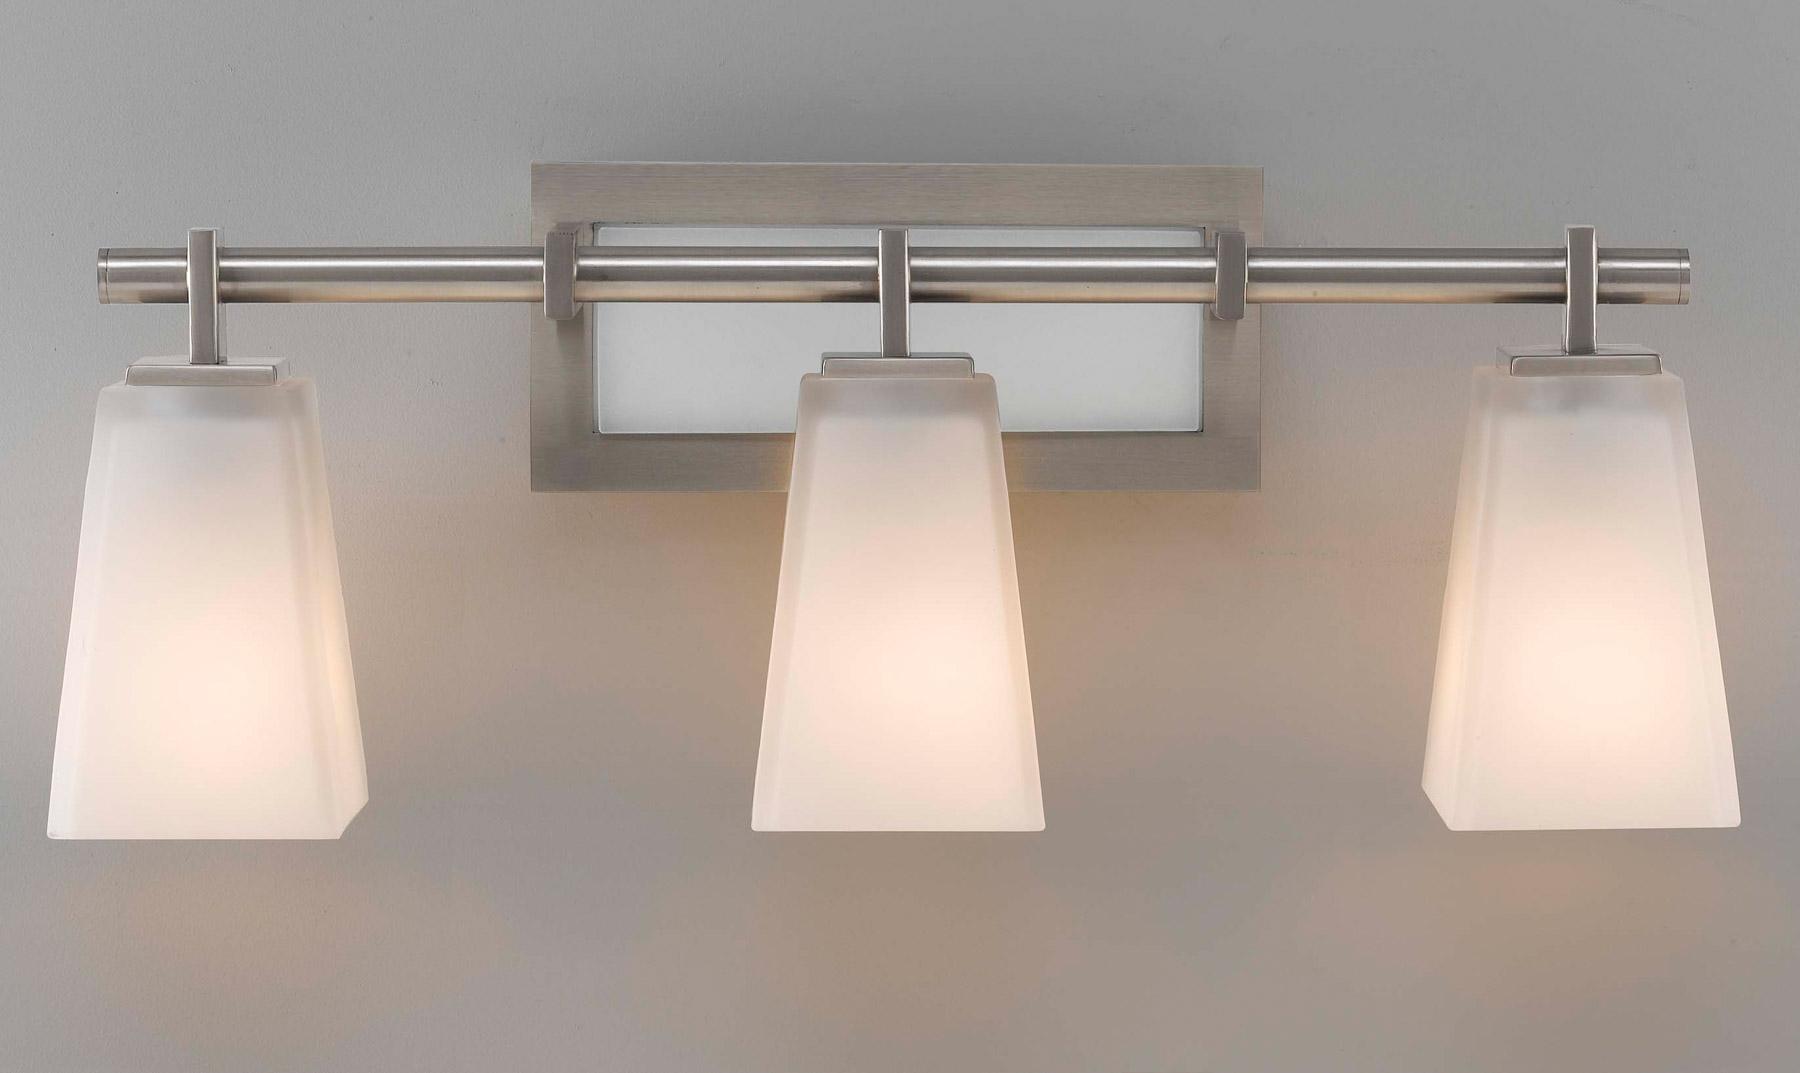 wall lighting bathroom vanity lights murray feiss vs16603 bs. Black Bedroom Furniture Sets. Home Design Ideas